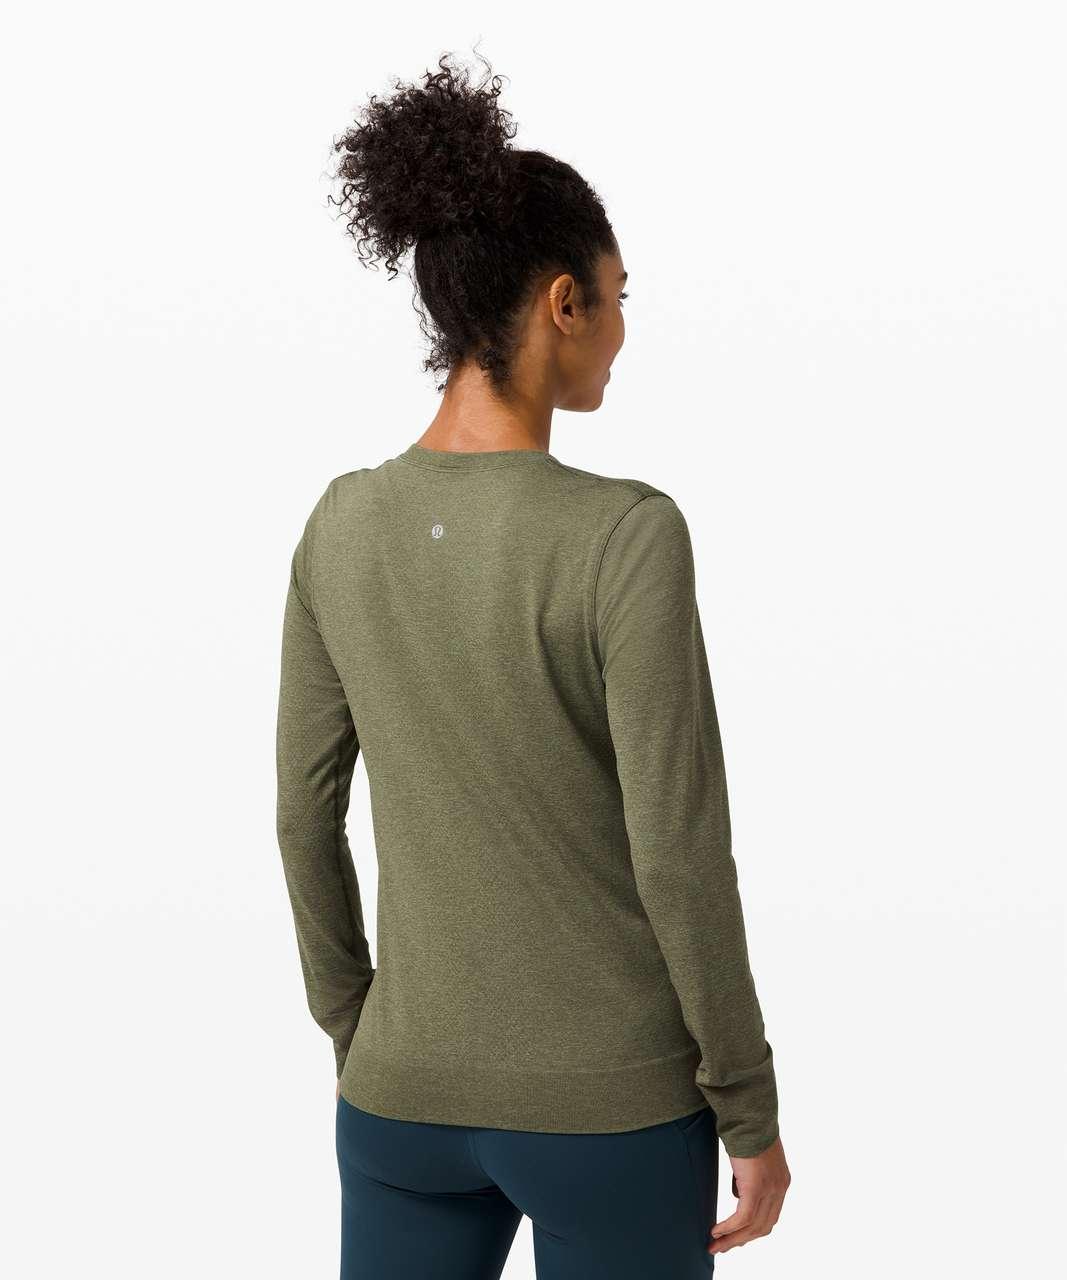 Lululemon Swiftly Breathe Long Sleeve - Willow Green / Army Green